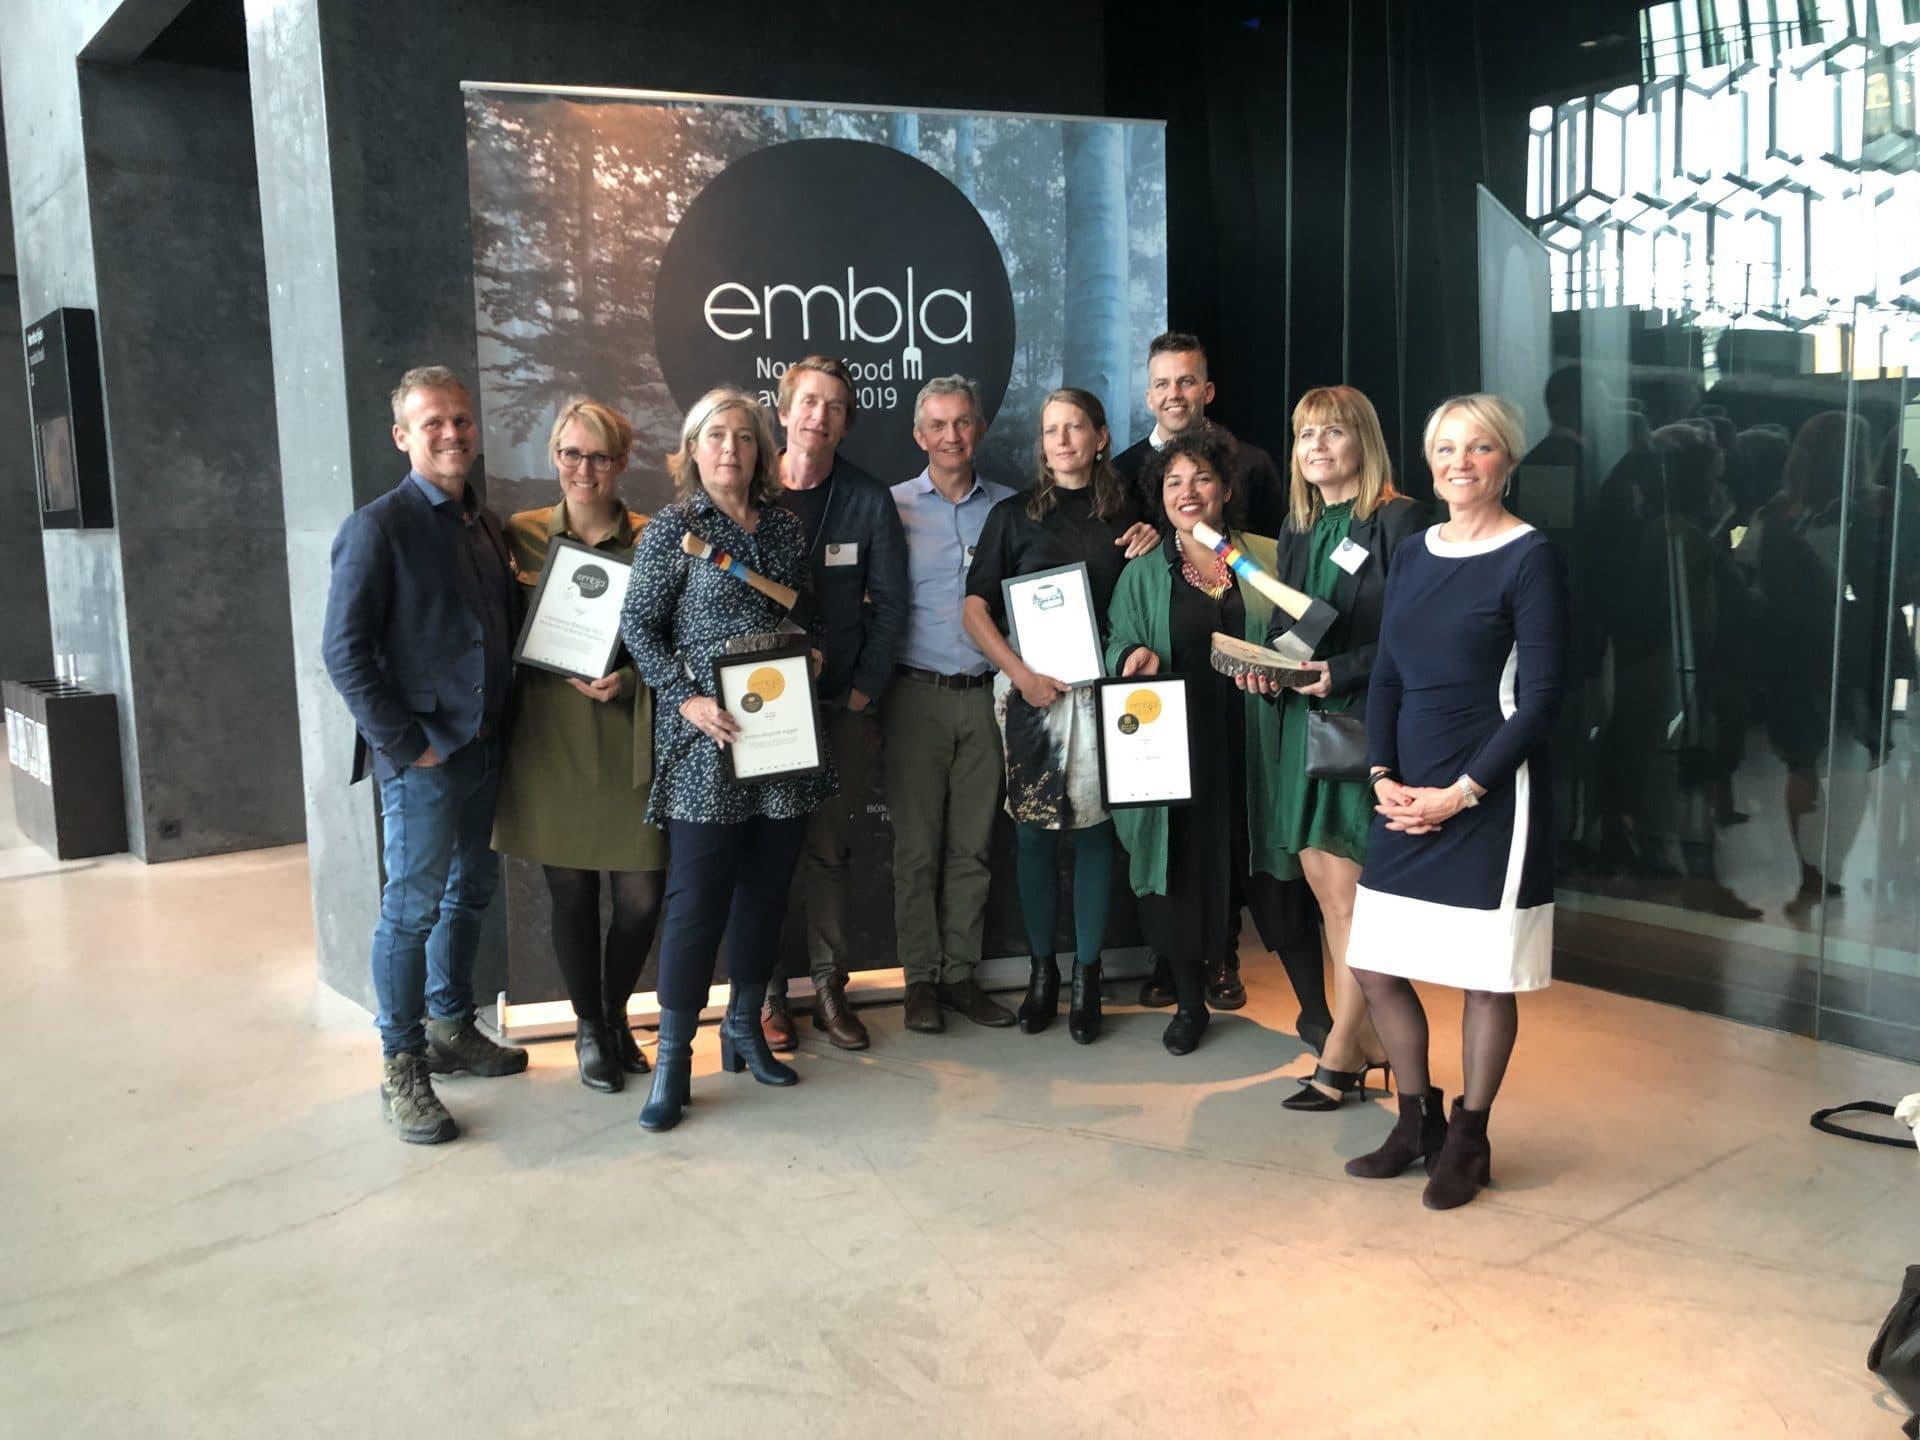 Embla prisen 2019